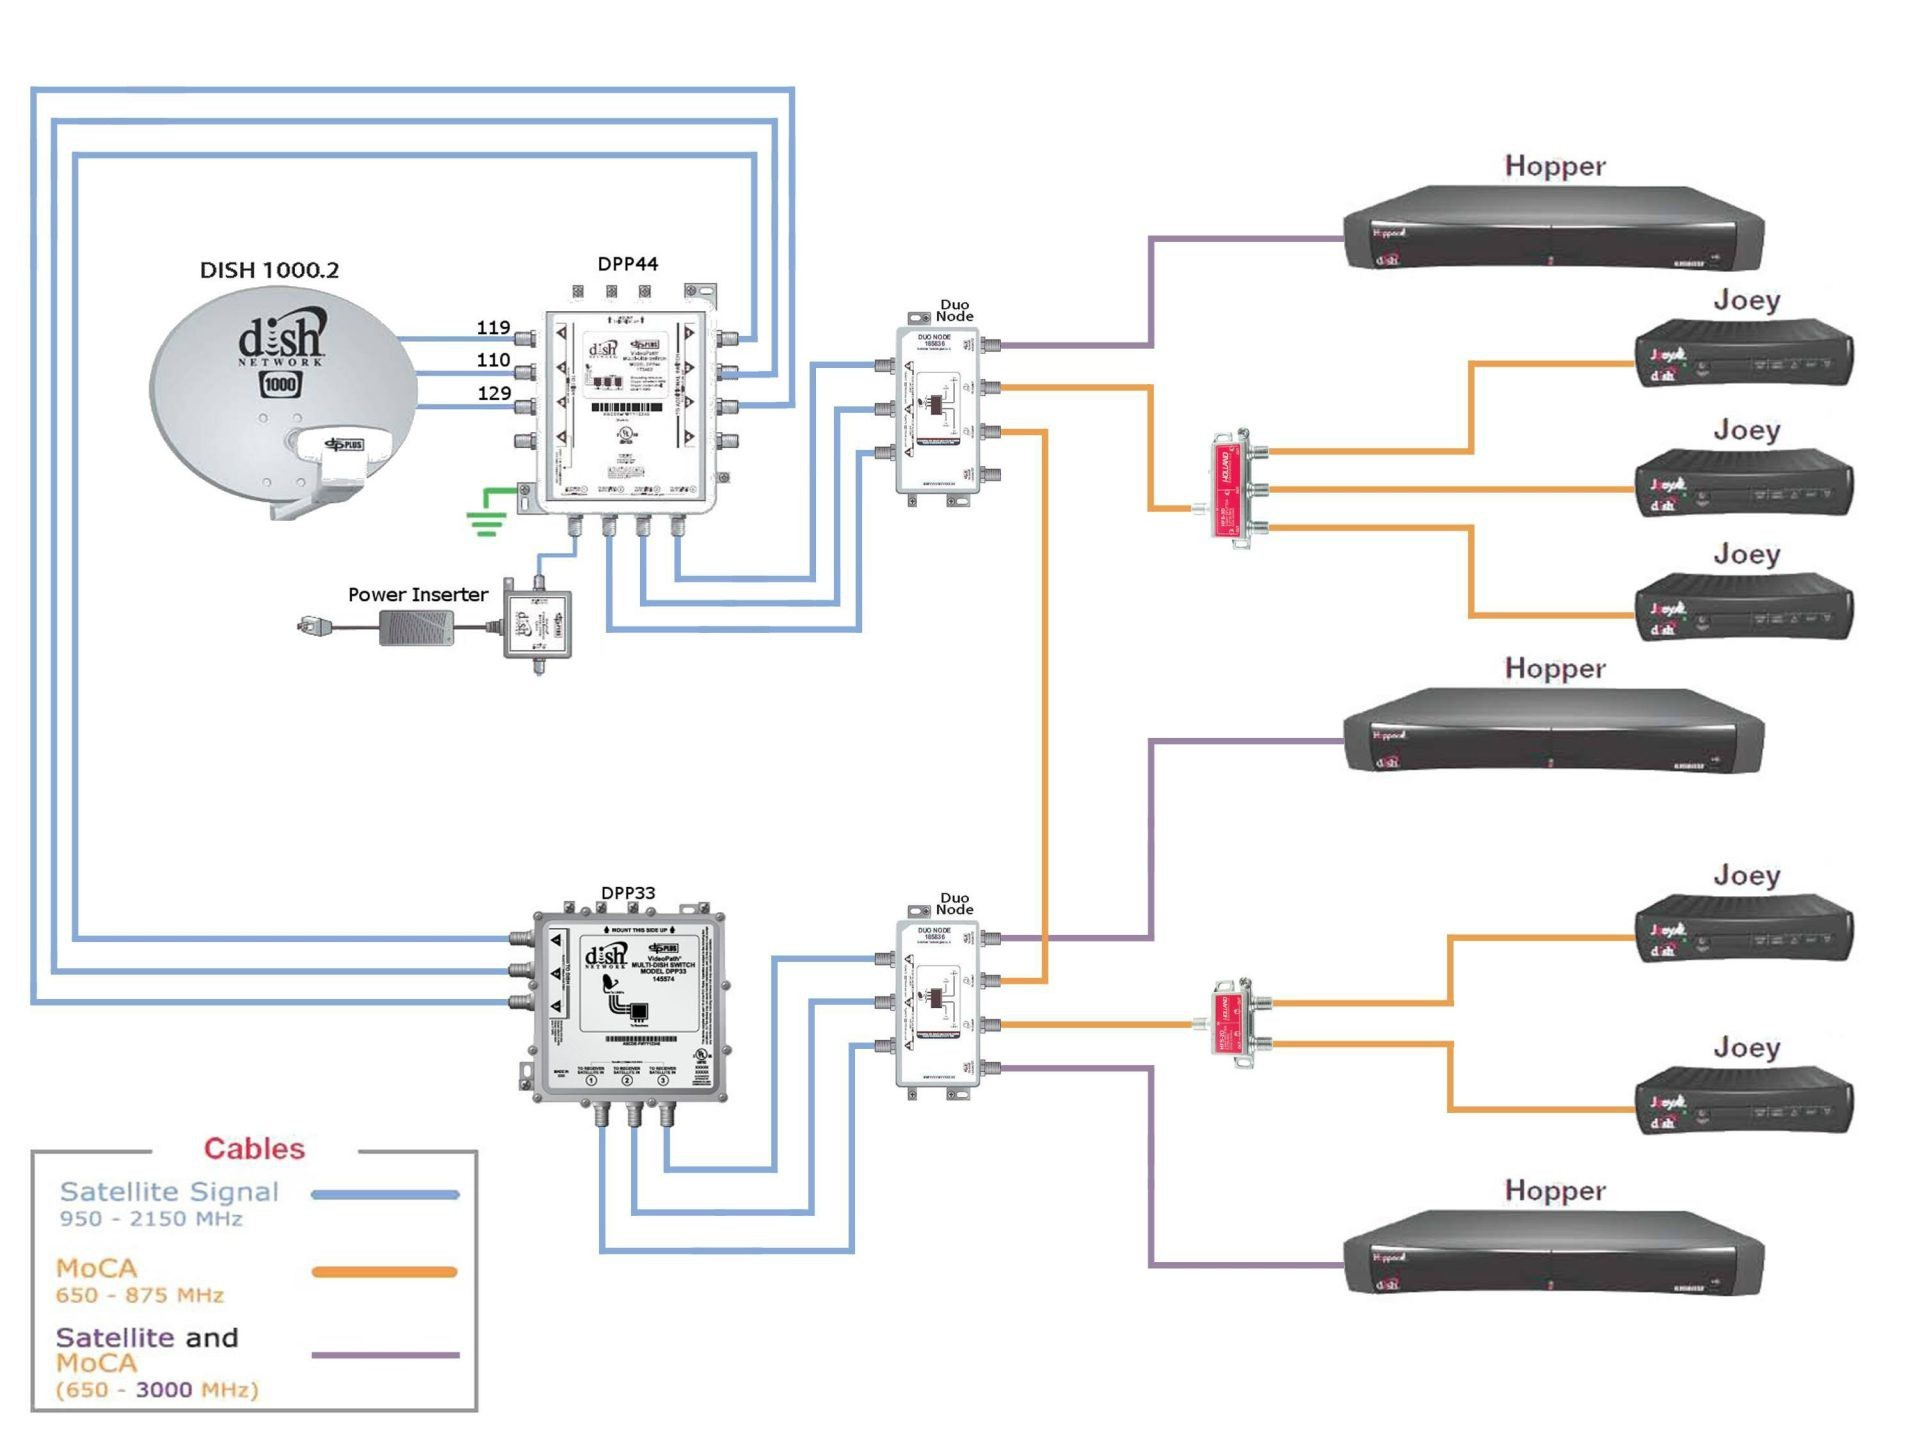 Satellite Dish Wiring Diagram Elegant Rv Cable and Satellite Wiring Diagram Diagram Of Satellite Dish Wiring Diagram